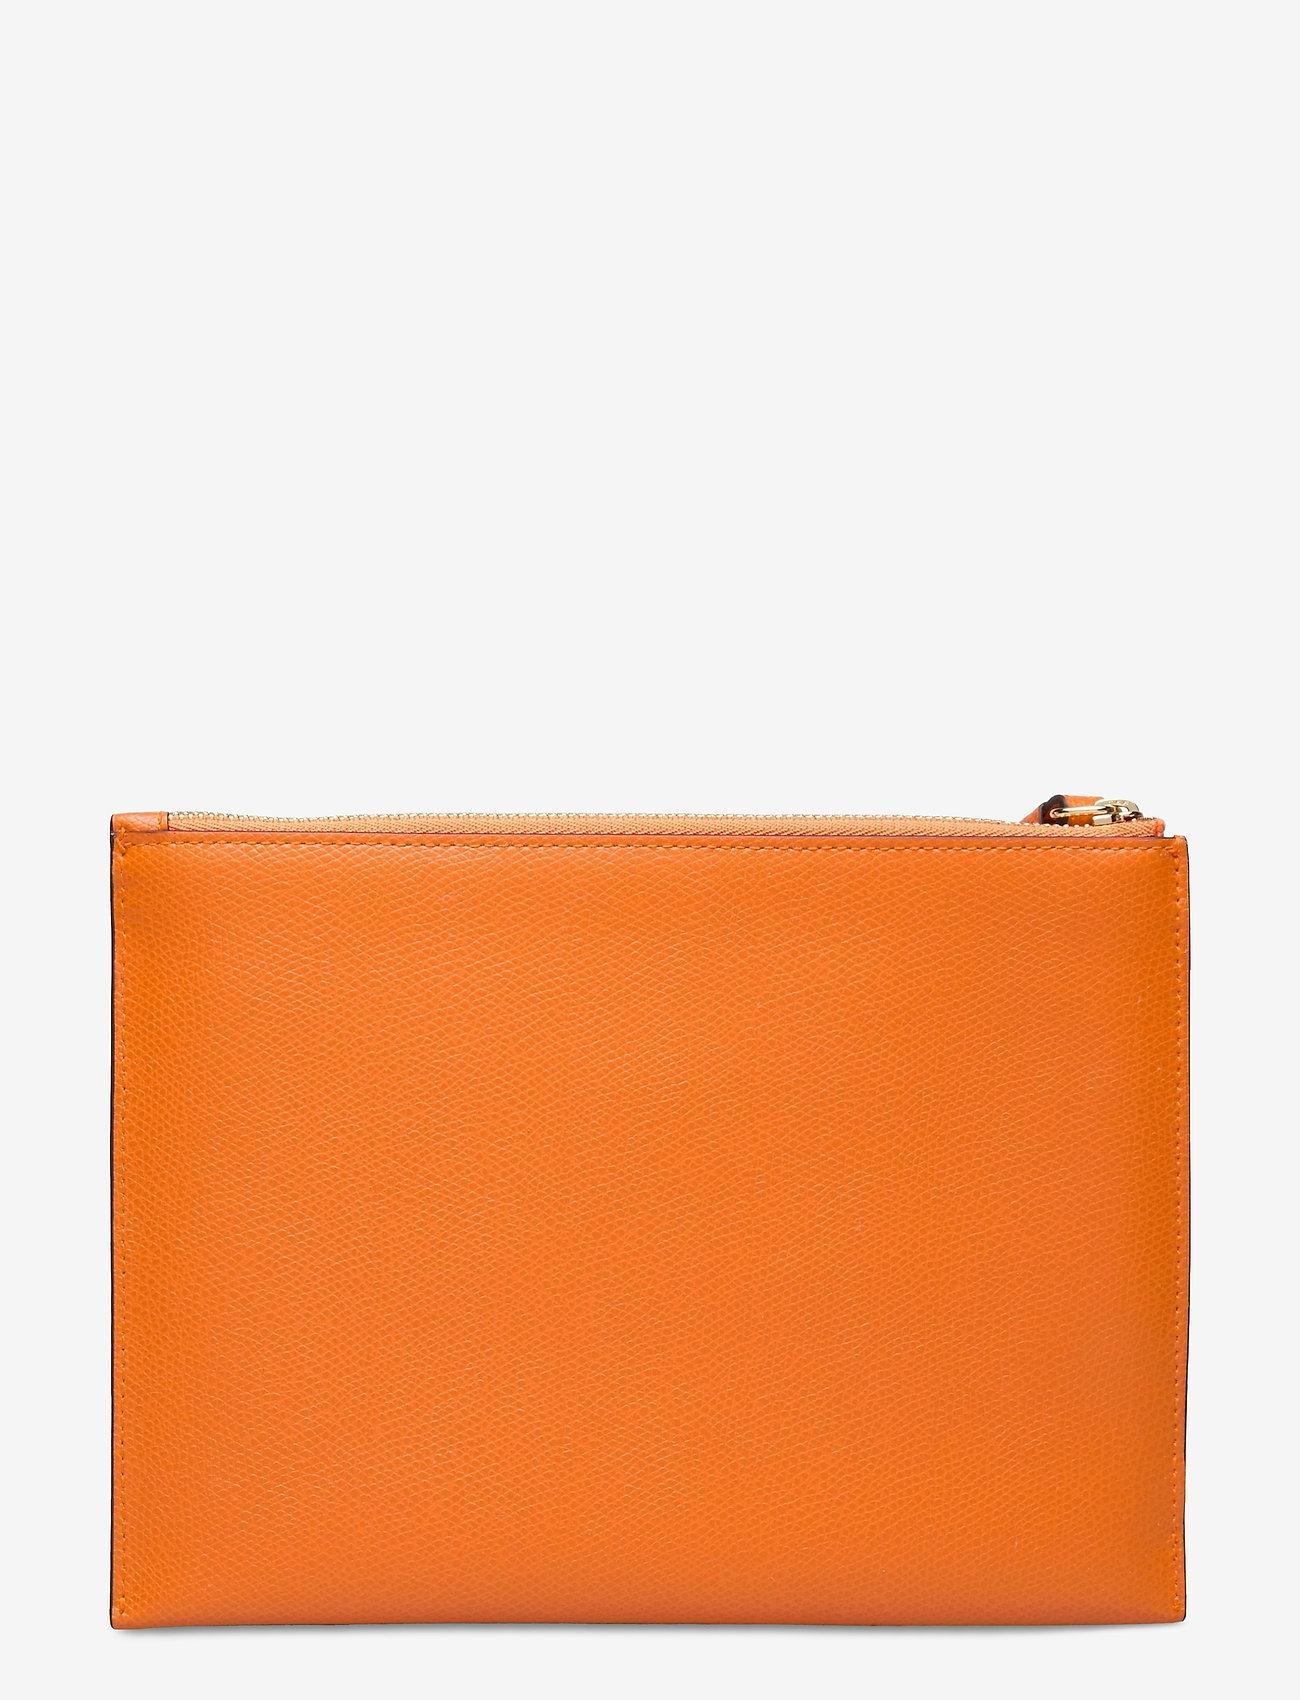 Furla - FURLA BABYLON S ENVELOPE - laukut - orange i - 1